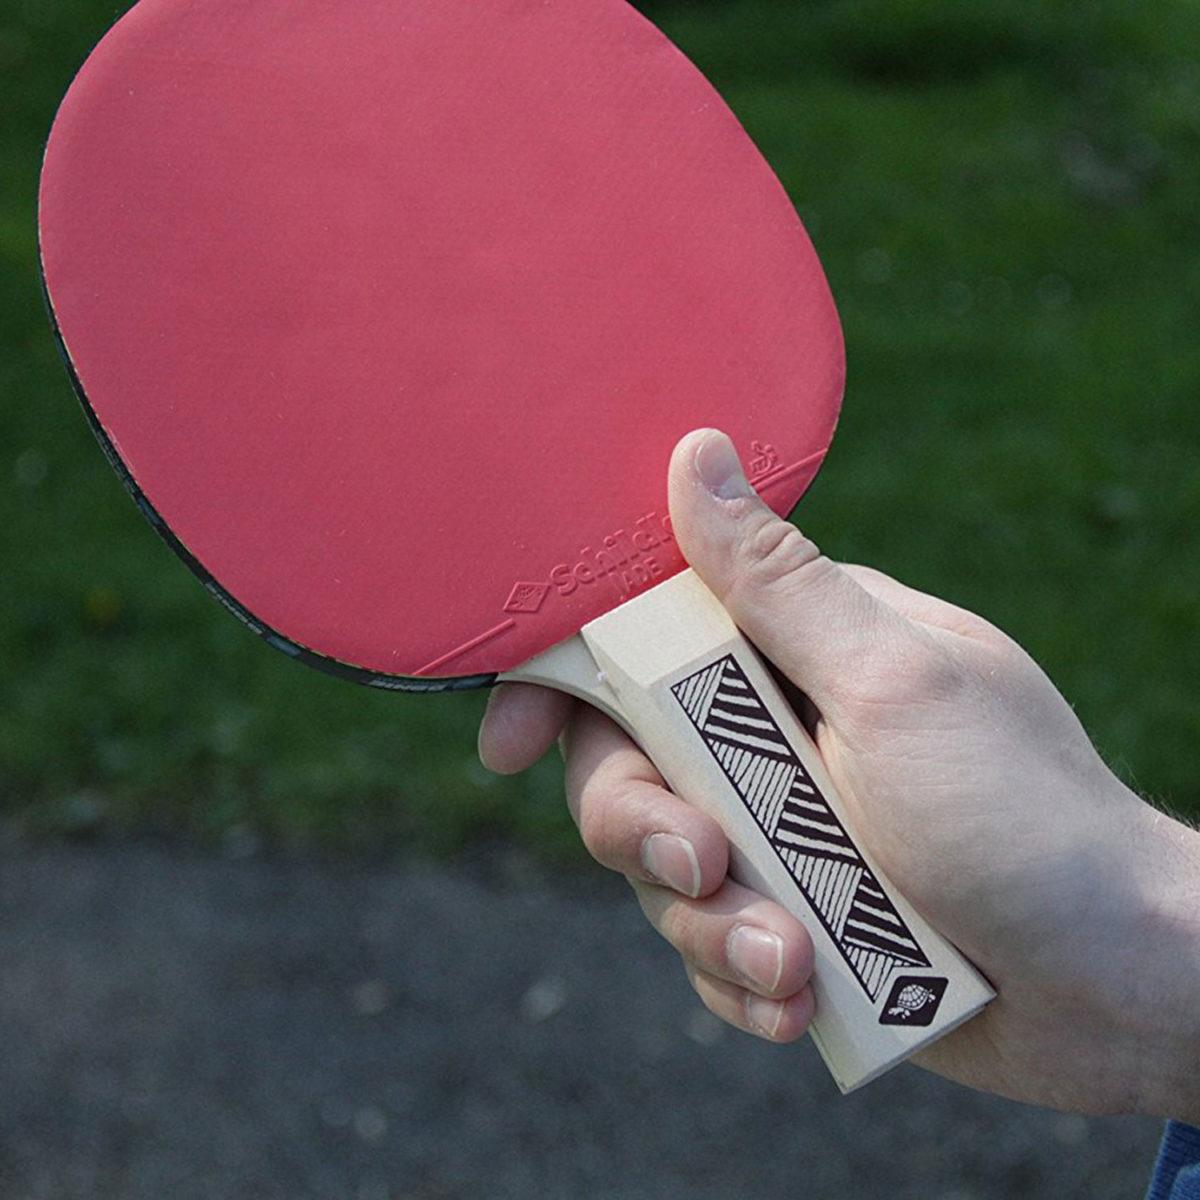 DONIC Champs 150 набор для настольного тенниса - 5